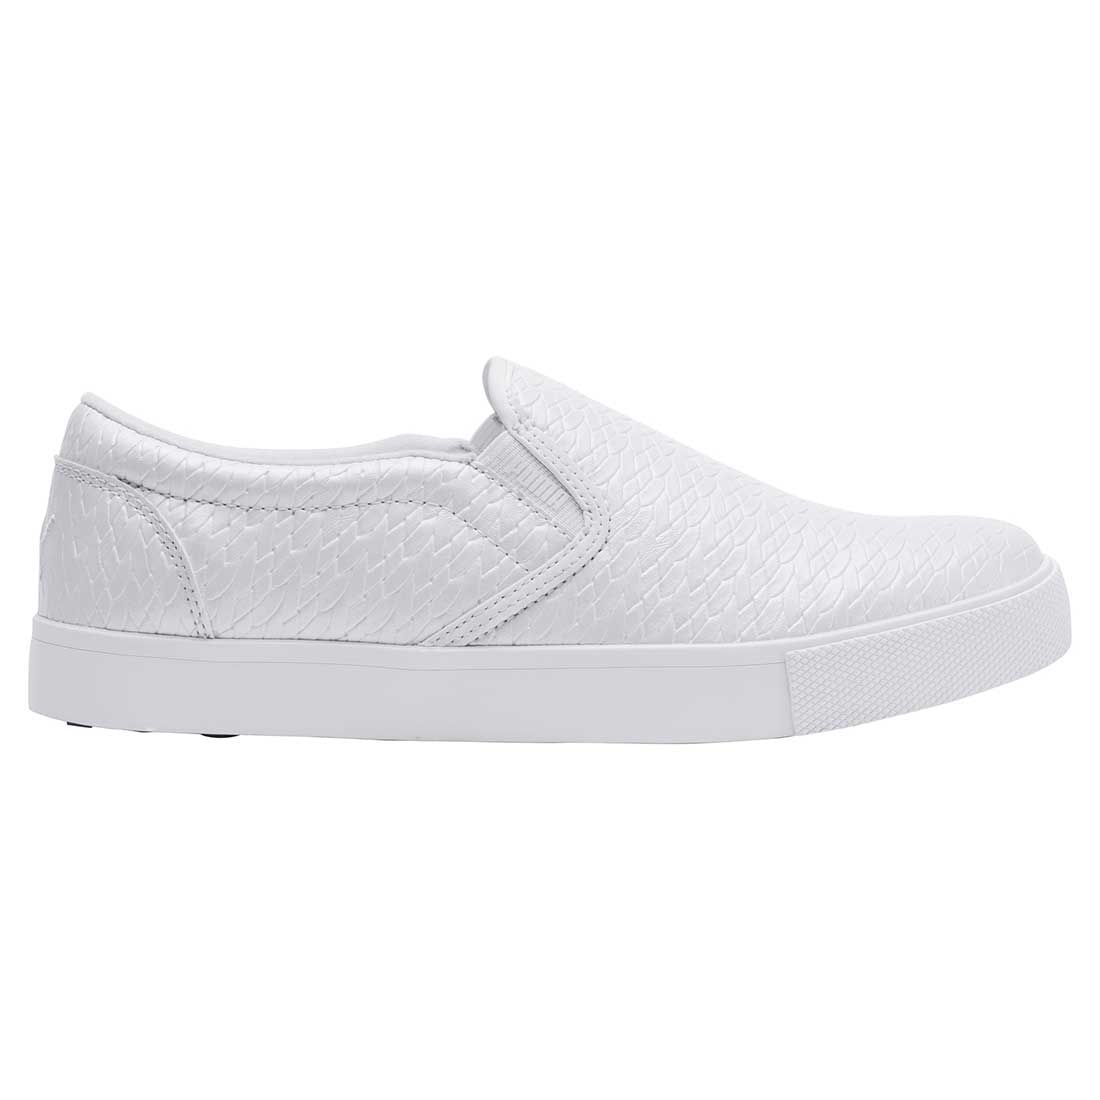 Tustin Slip-On Golf Shoes White